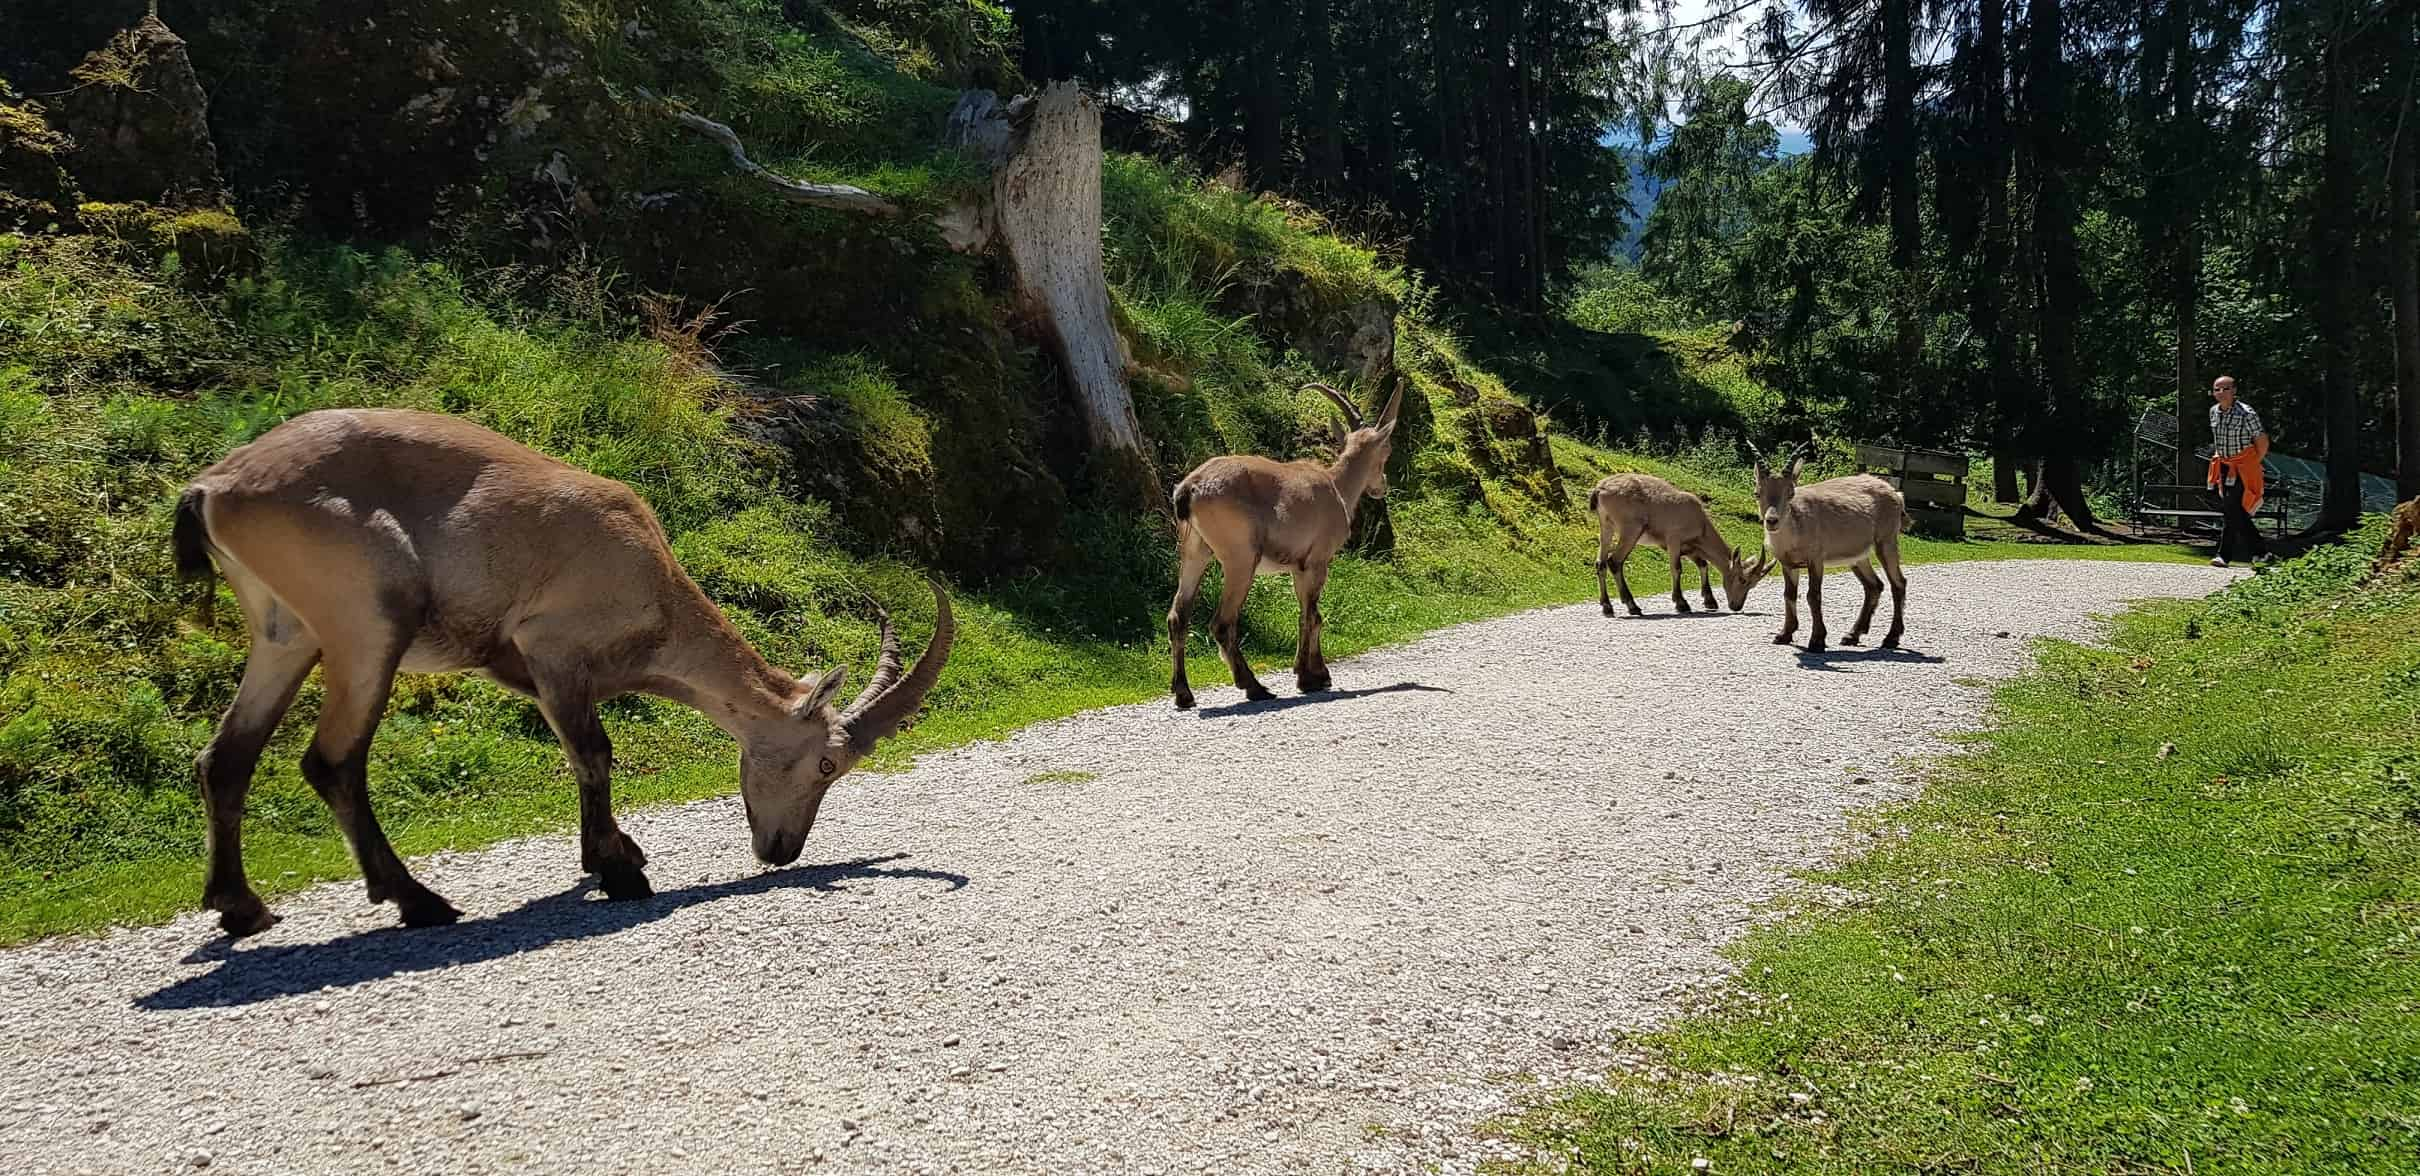 Steinböcke beim Spaziergang durch Tierpark Rosegg Nähe Wörthersee